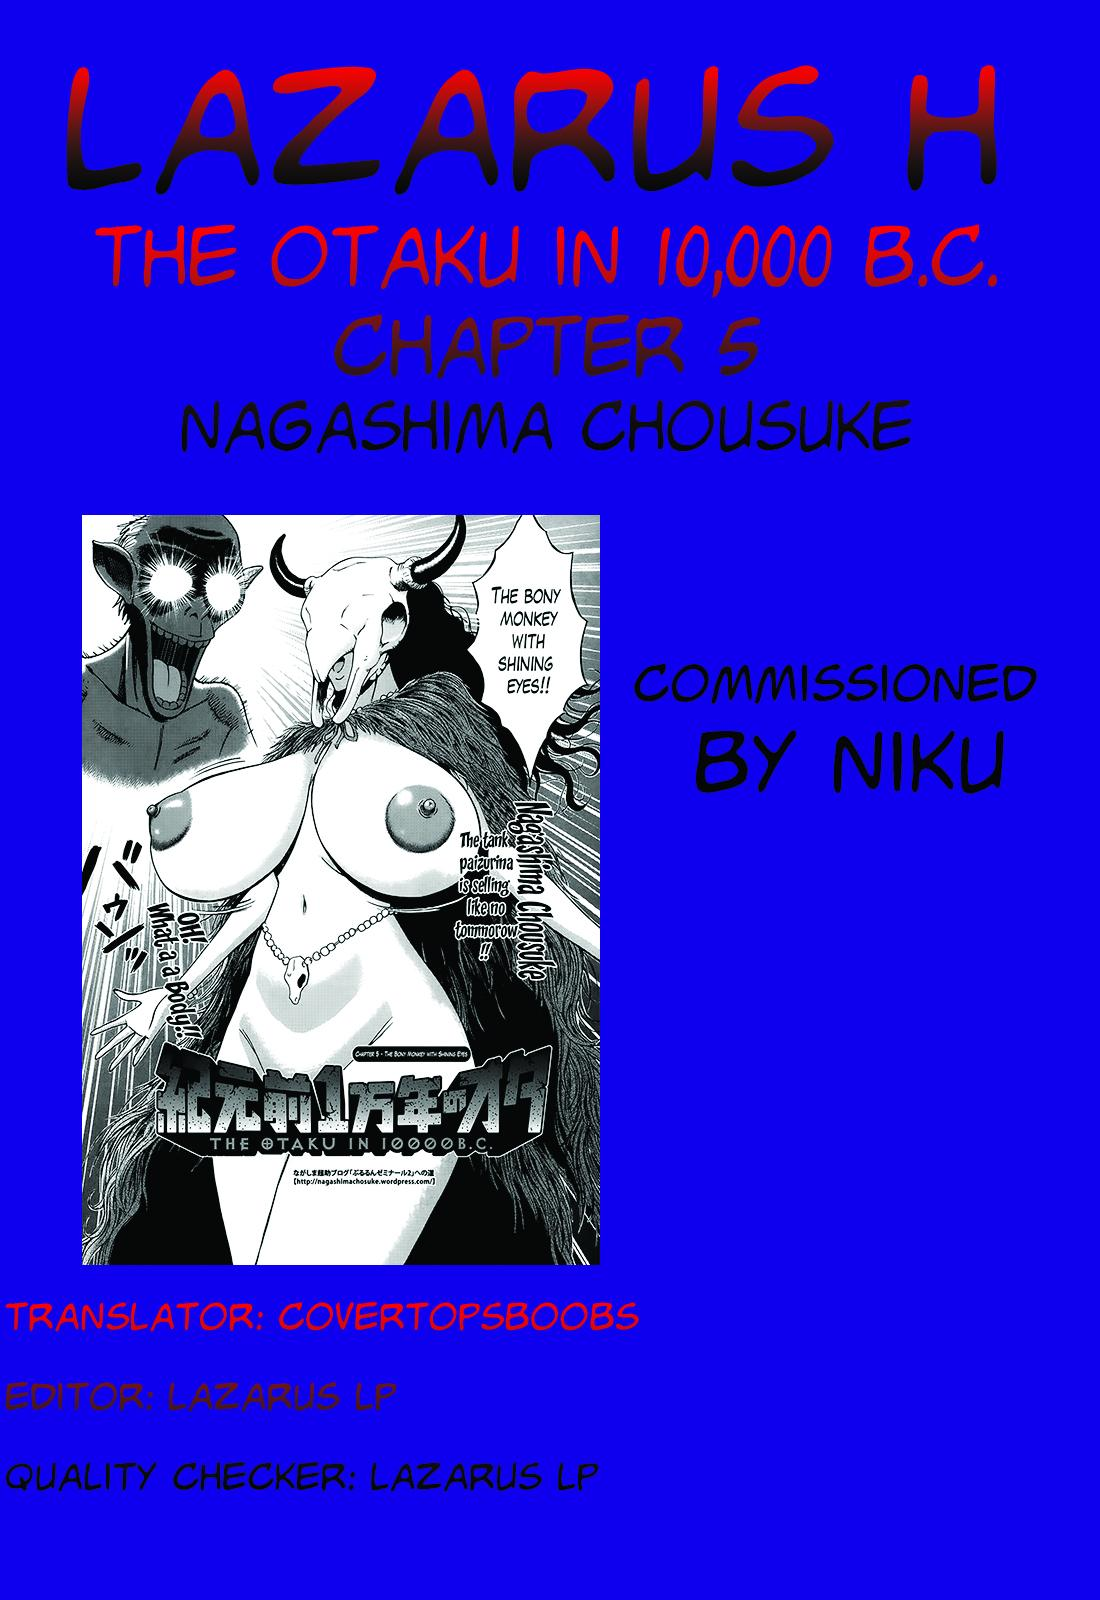 Kigenzen 10000 Nen no Ota   The Otaku in 10,000 B.C. Ch. 1-22 98